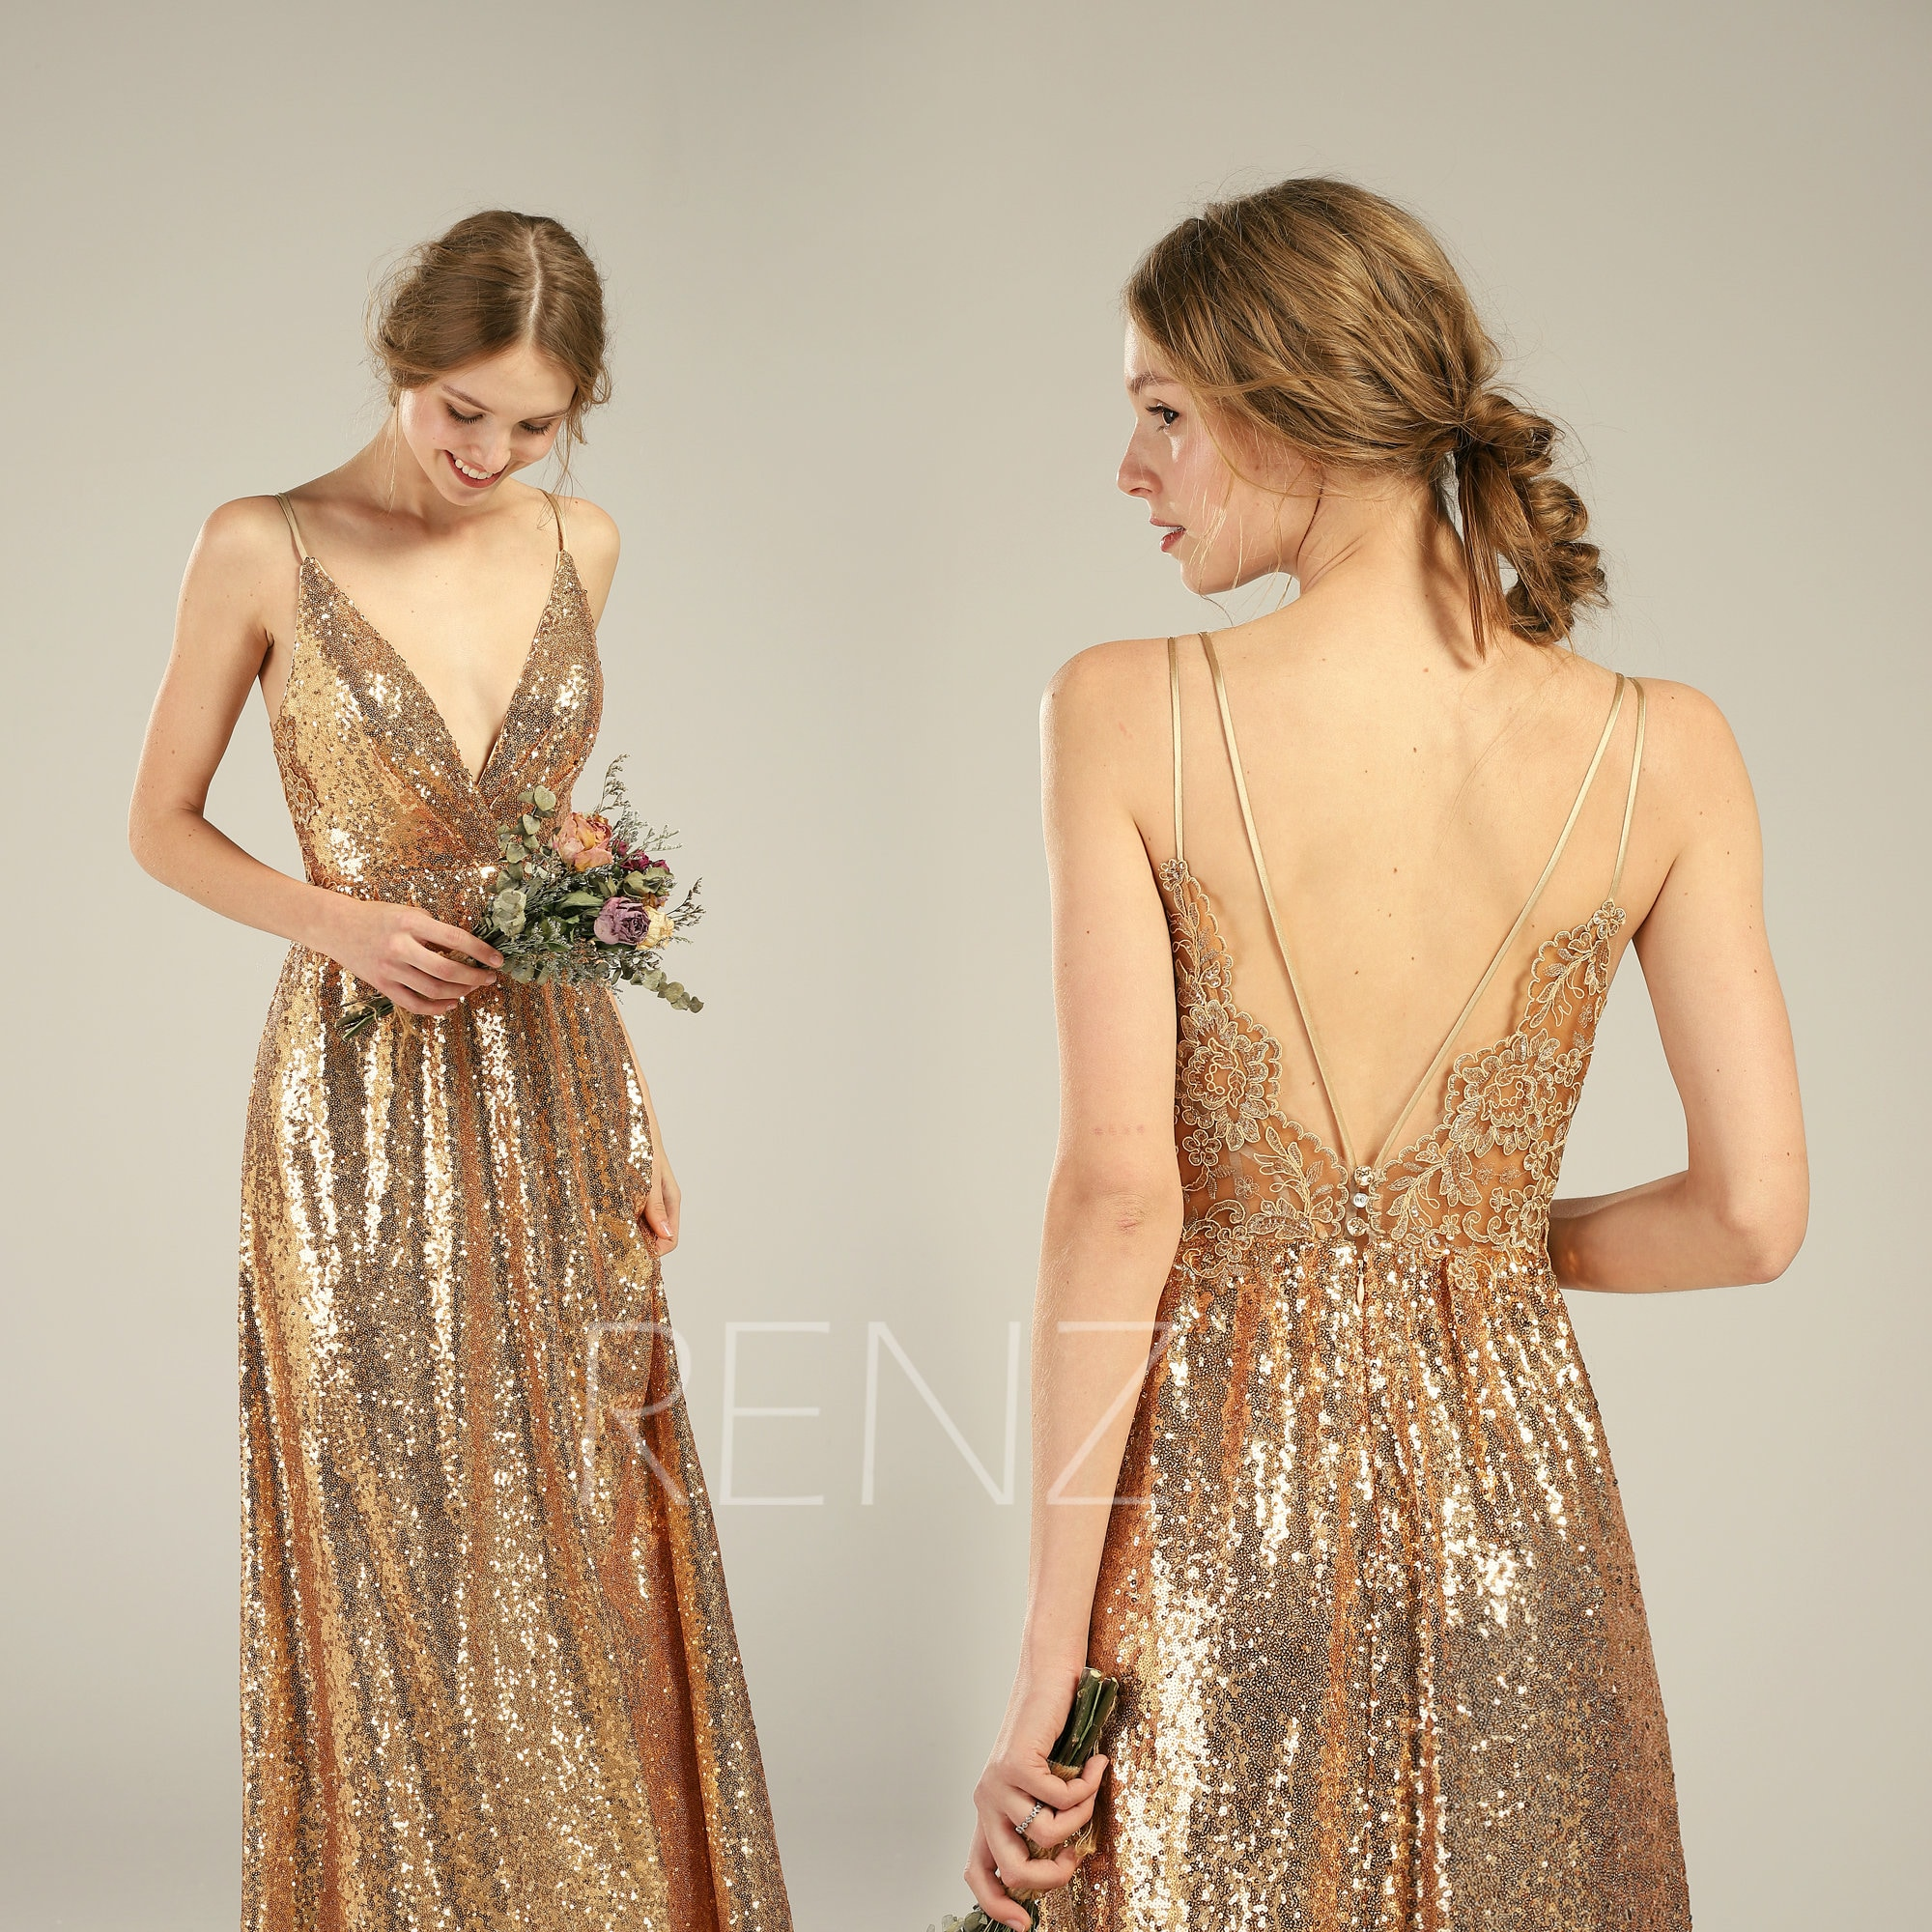 Bridesmaid Dress Gold Sequin Dress Lace Boho Wedding Dress V Neck Backless Wedding Gown Hq580